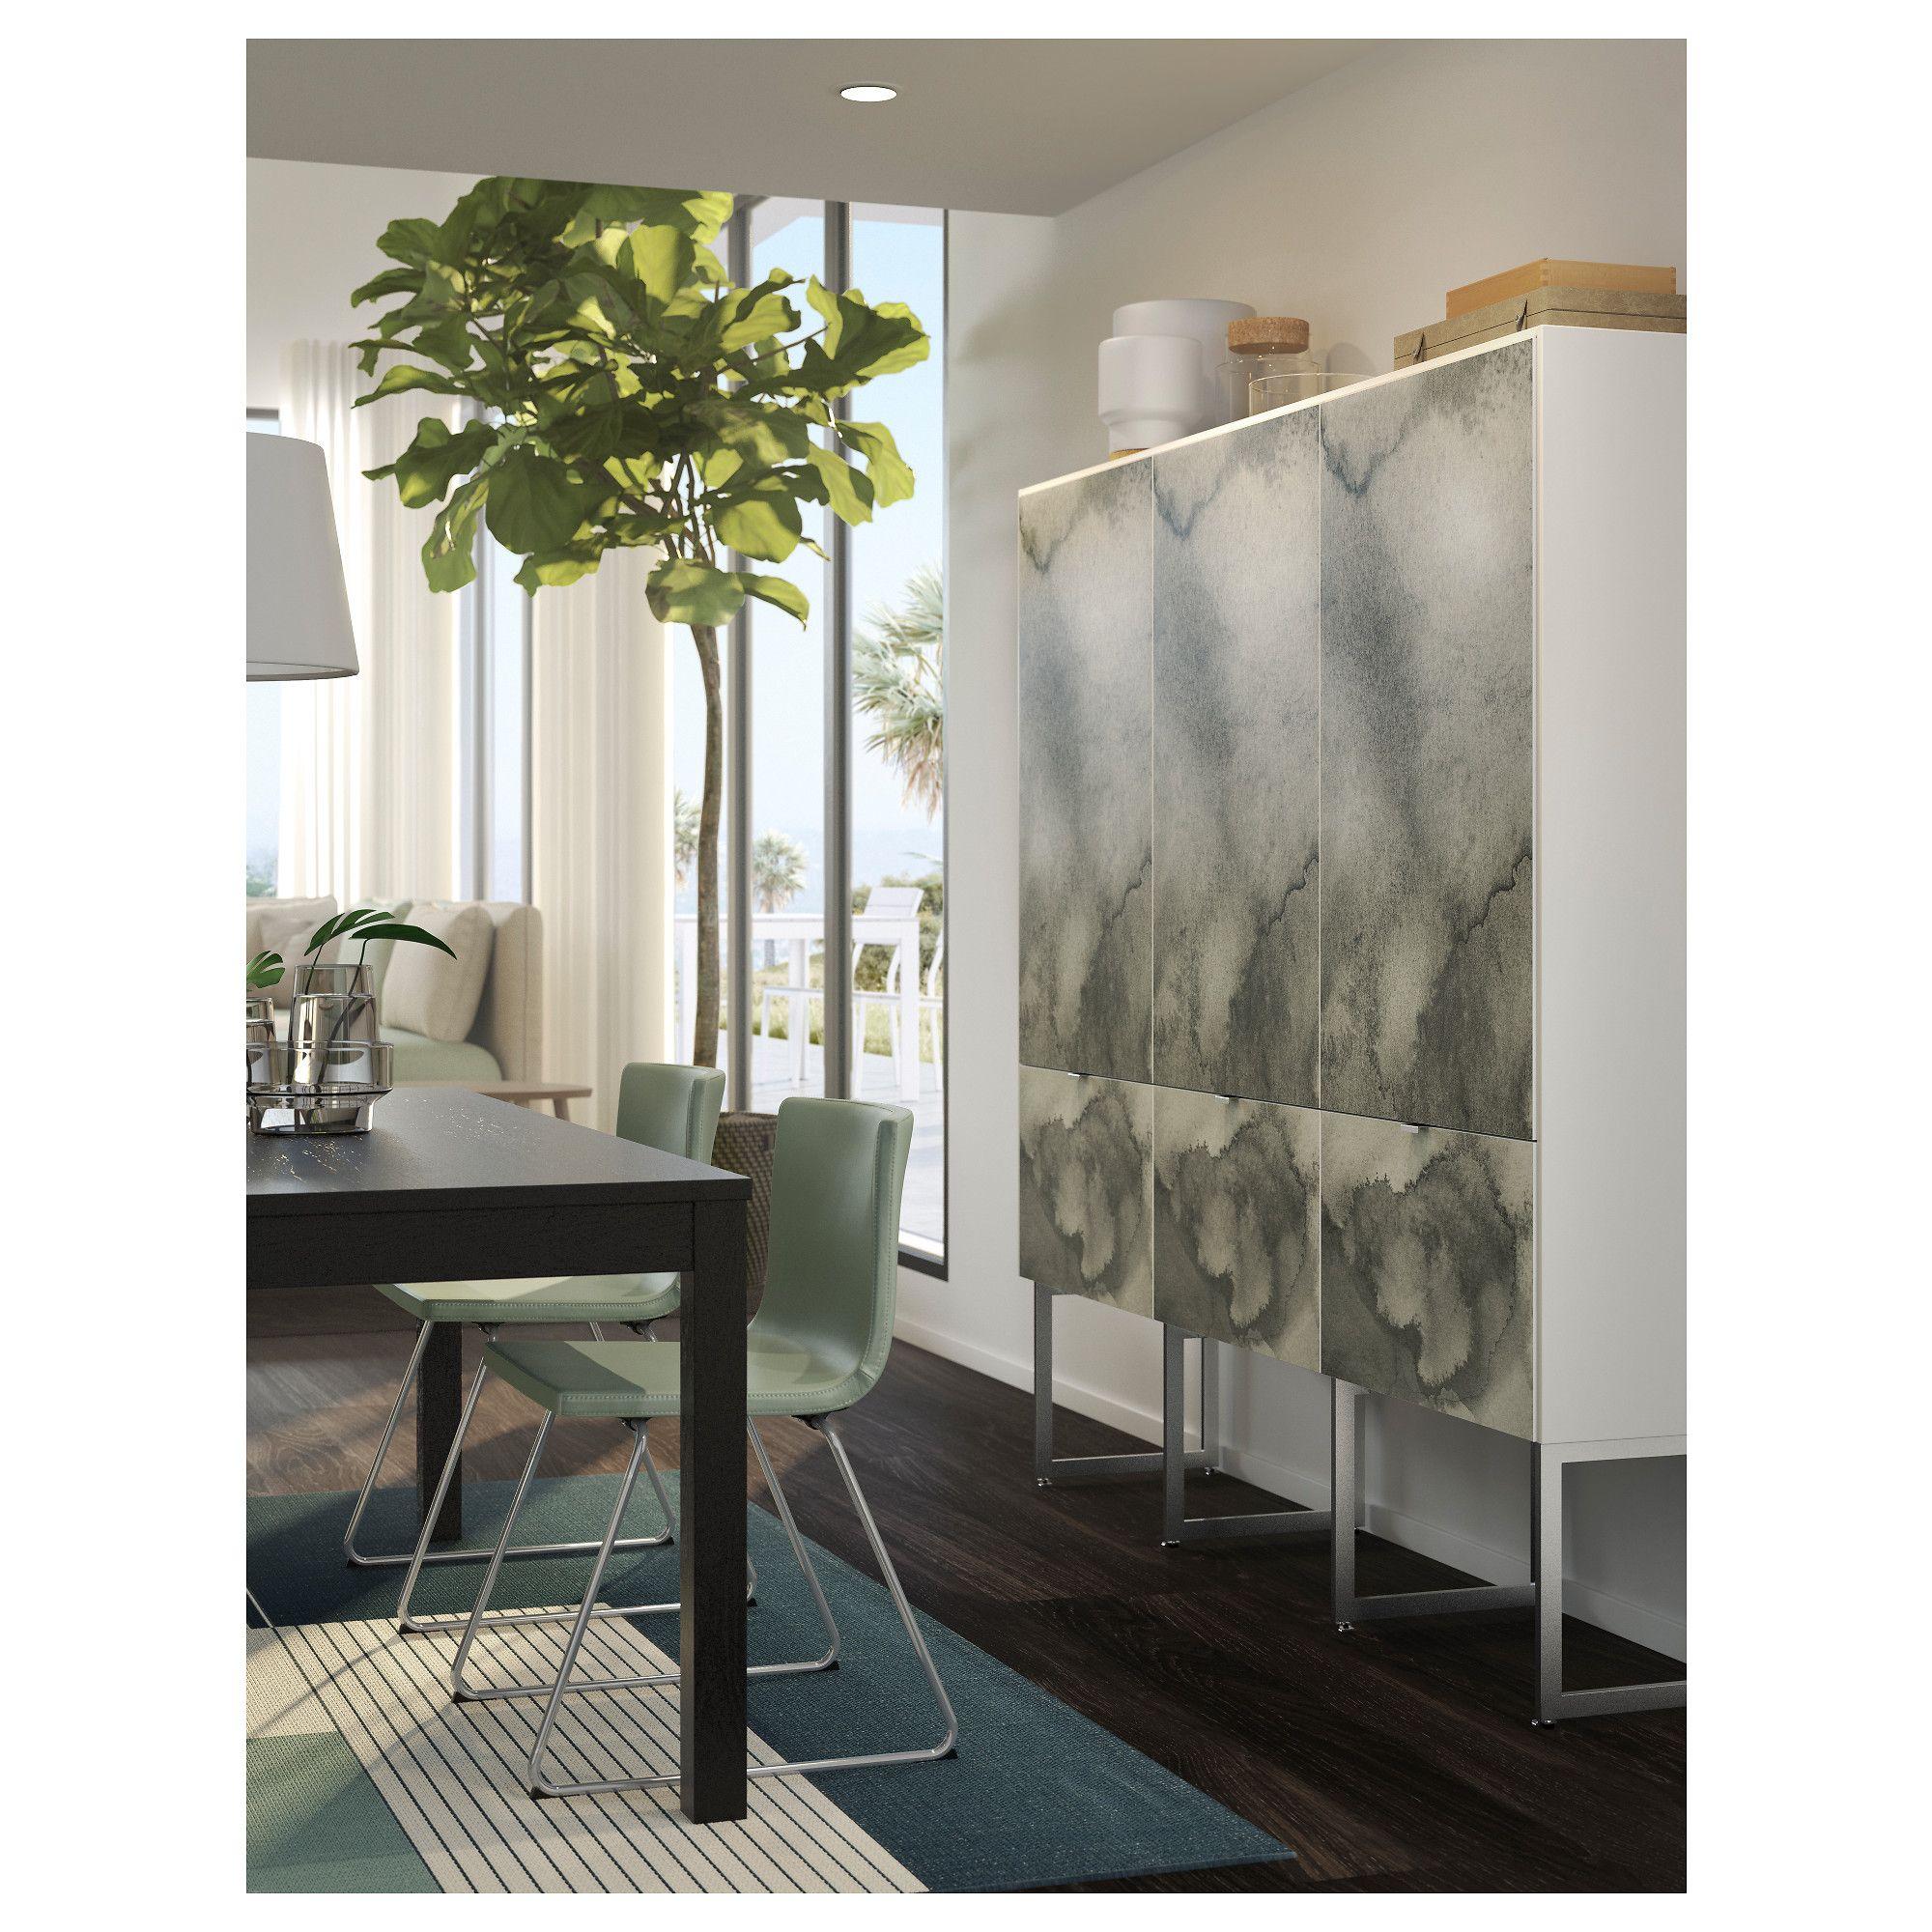 7efd4ec6023d828557e2a2524b3805b9 Impressionnant De Table Ikea Blanche Schème